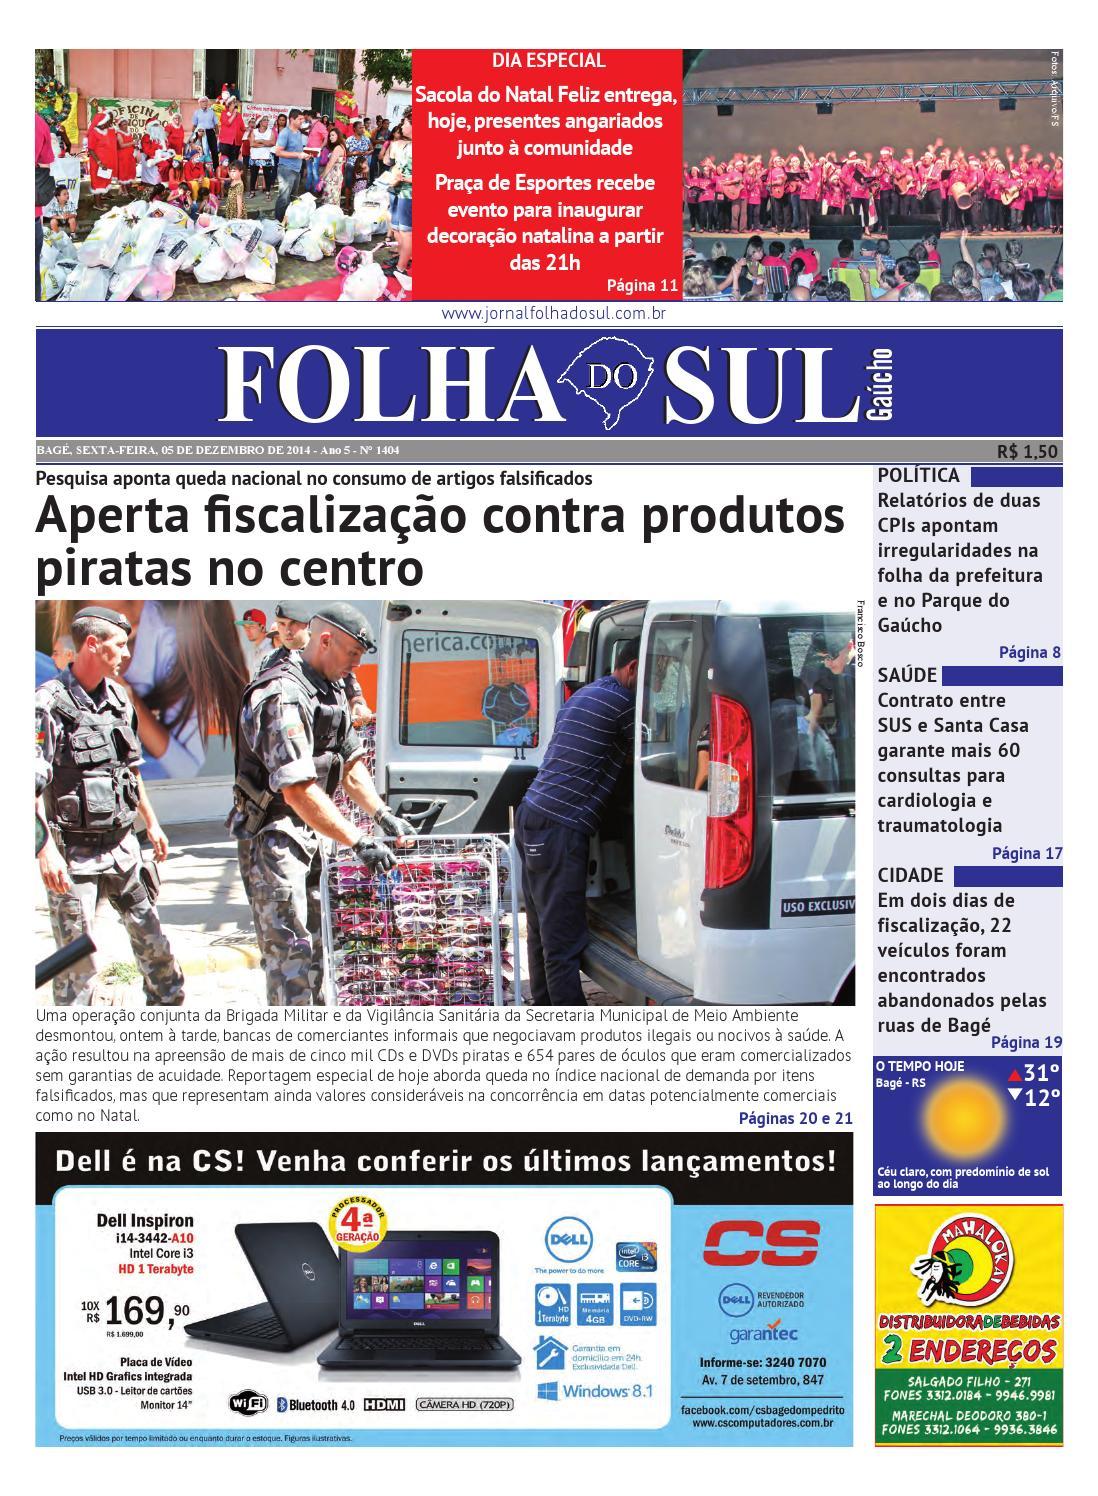 Folha do Sul Gaúcho Ed. 1404 (05 12 2014) by Folha do Sul Gaúcho - issuu 45a6d7ba74